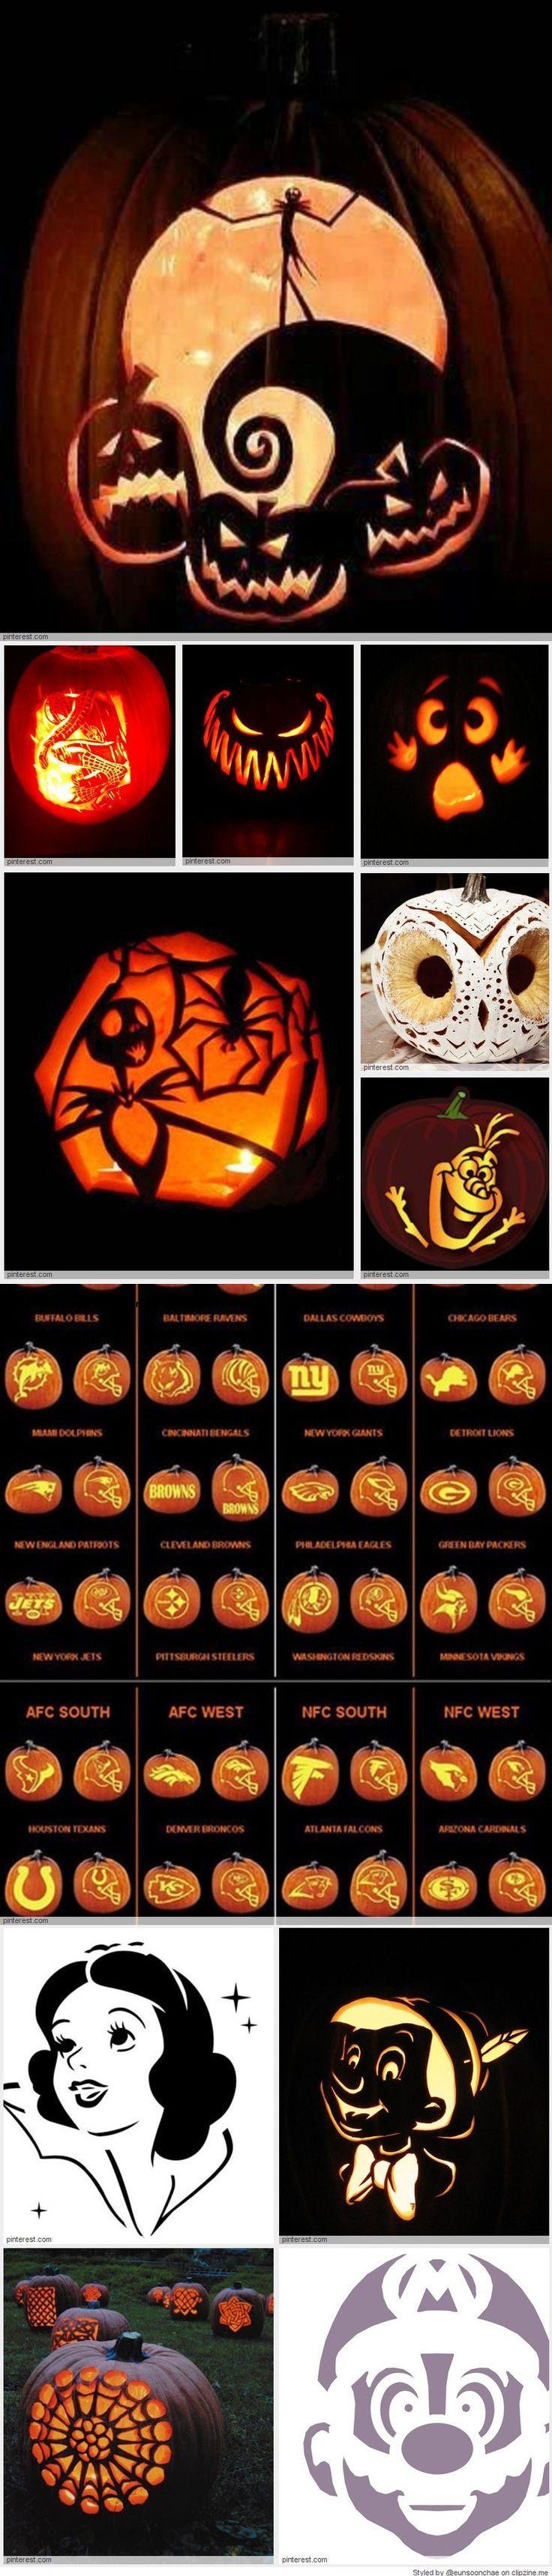 76 best halloween ideas }: images on pinterest bricolage